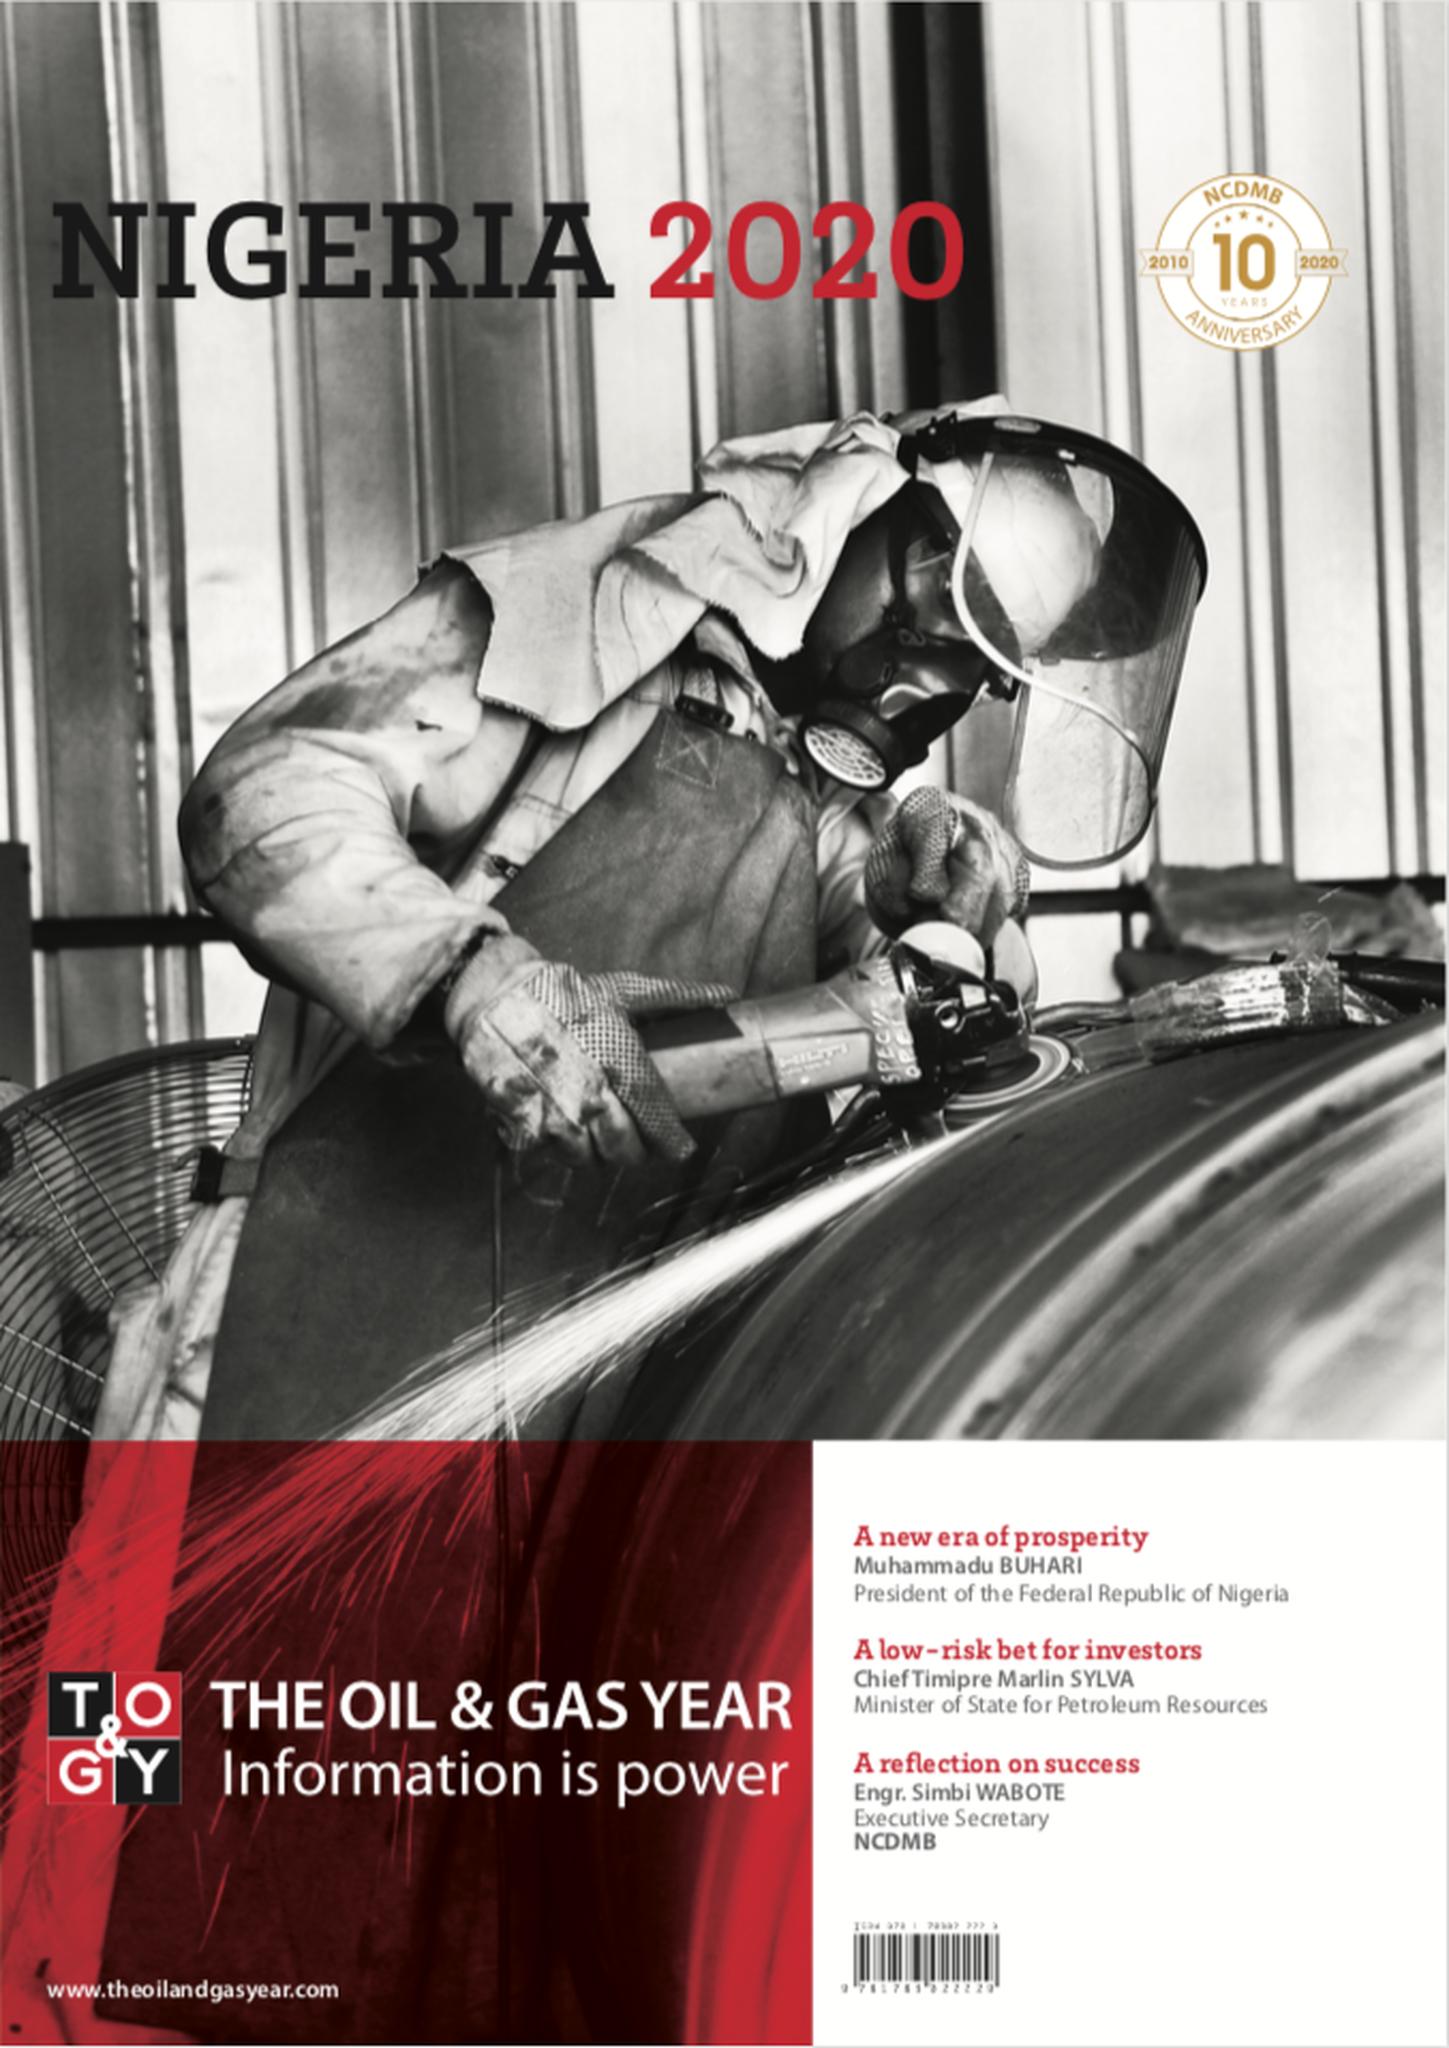 The Oil & Gas Year Nigeria 2020